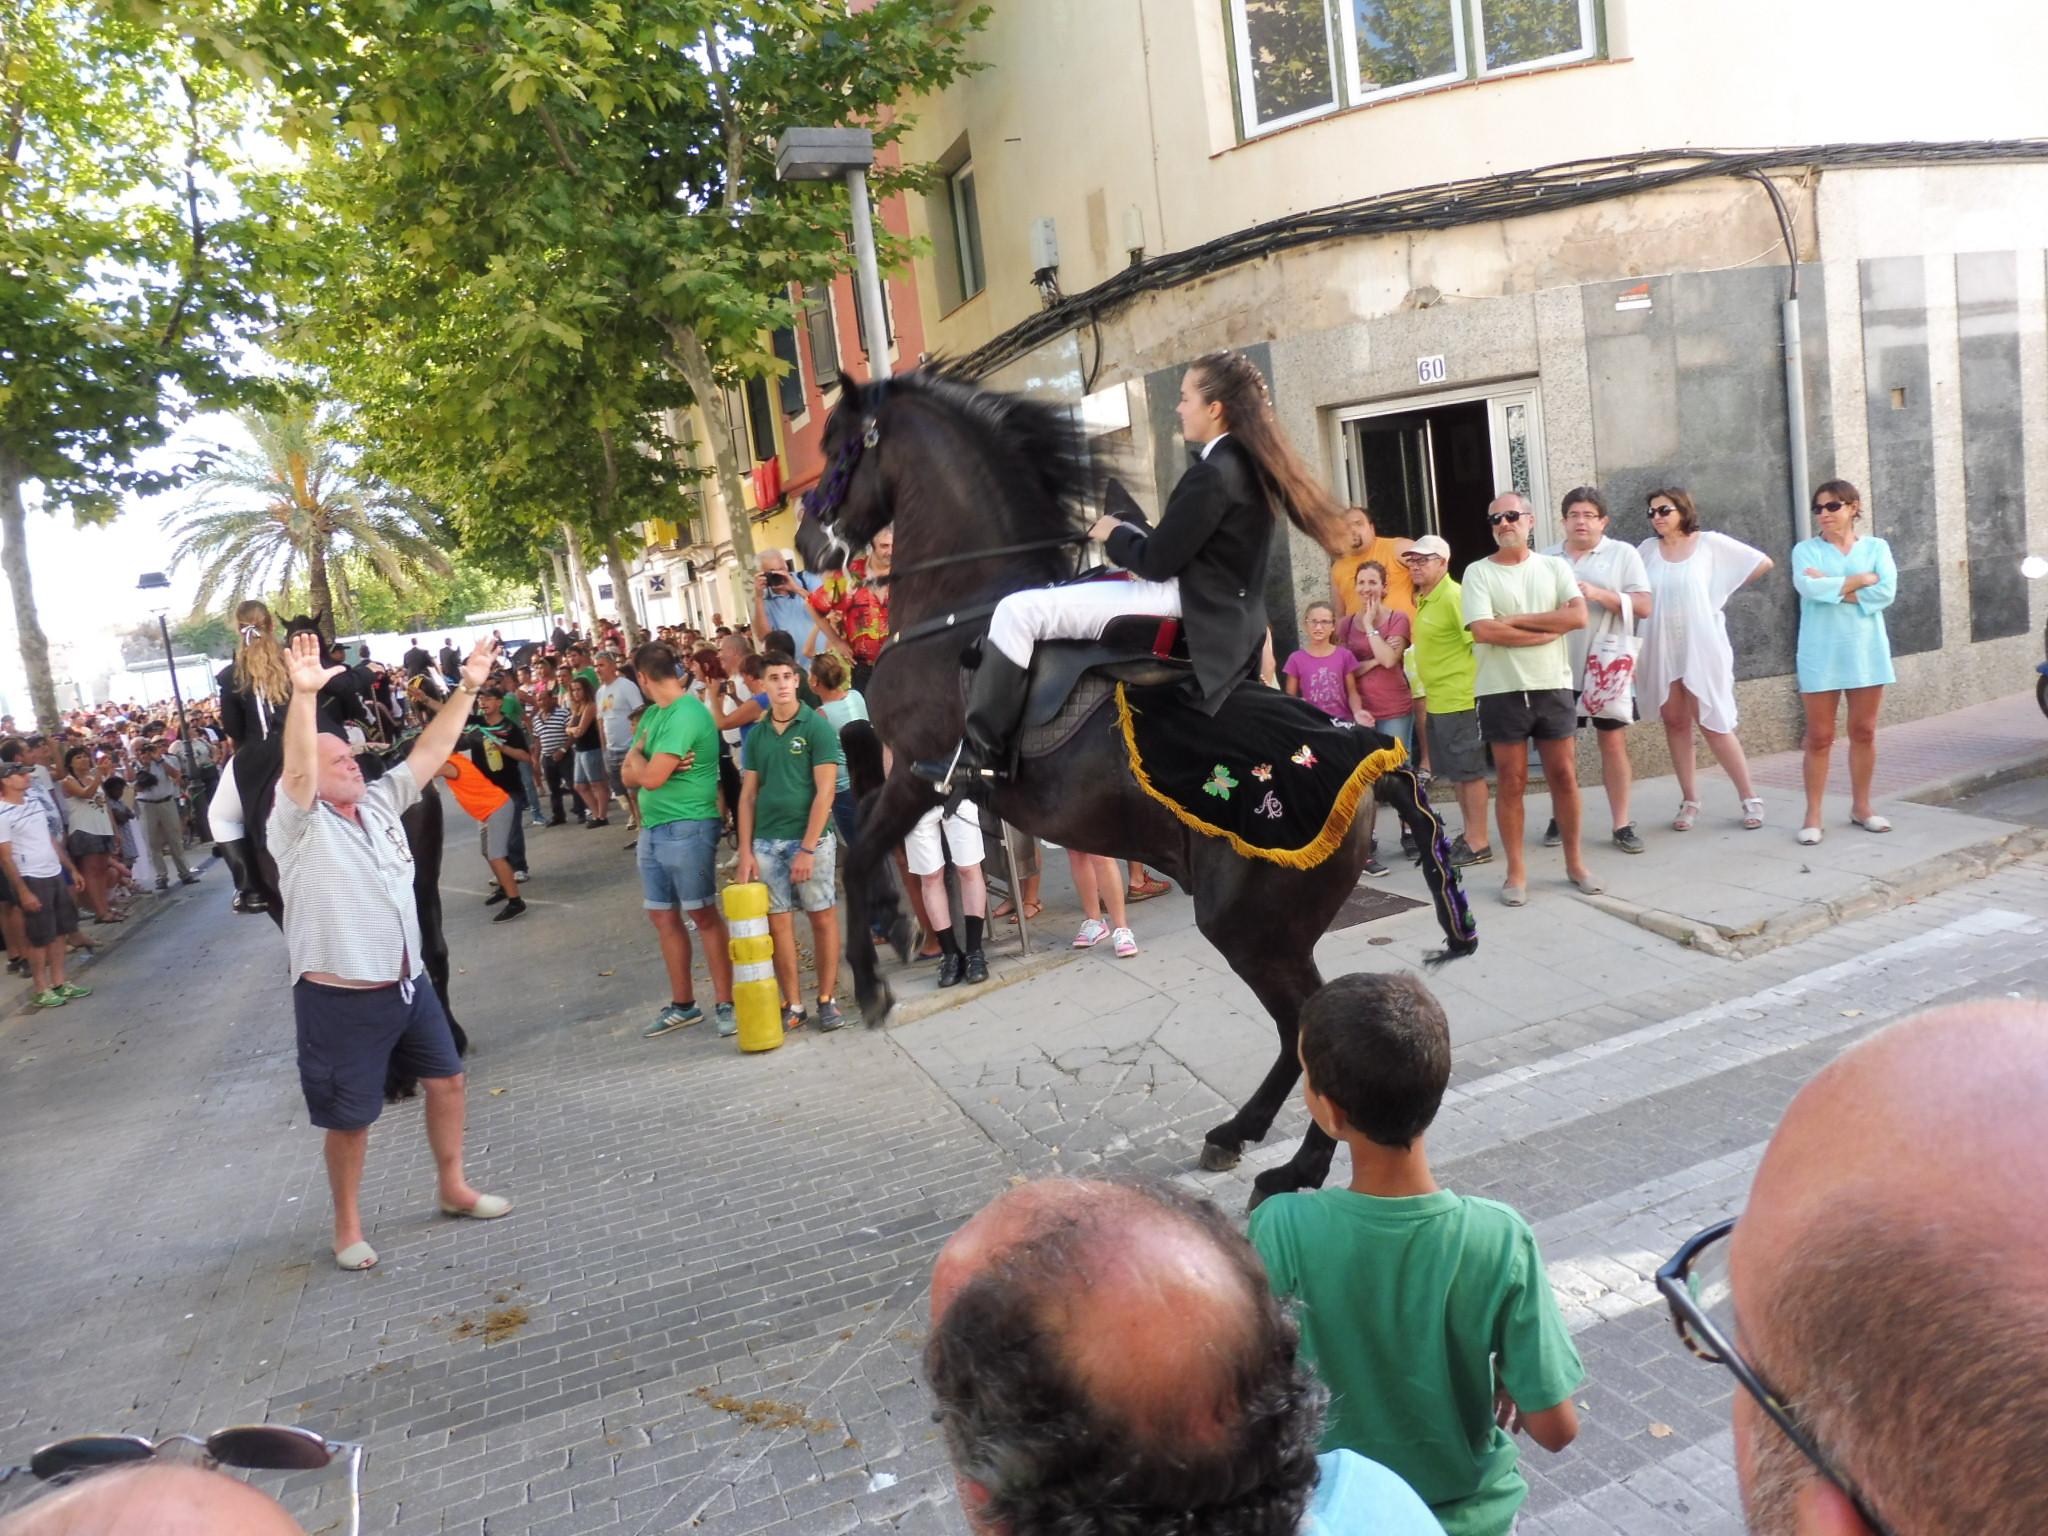 Mahon horses